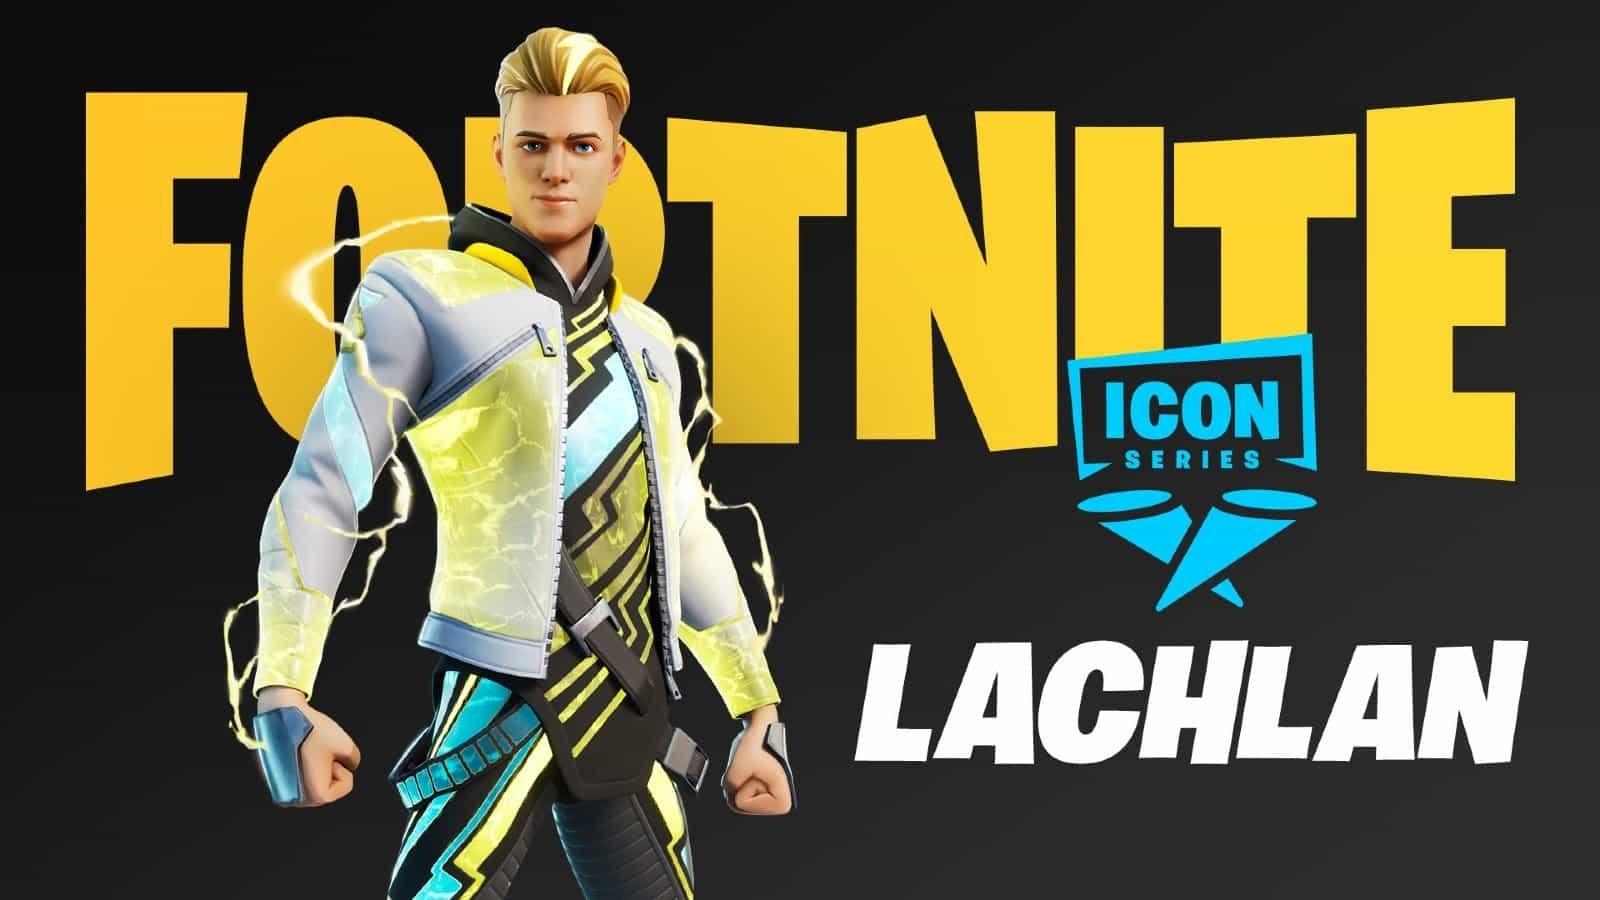 Fortnite Icon Lachlan